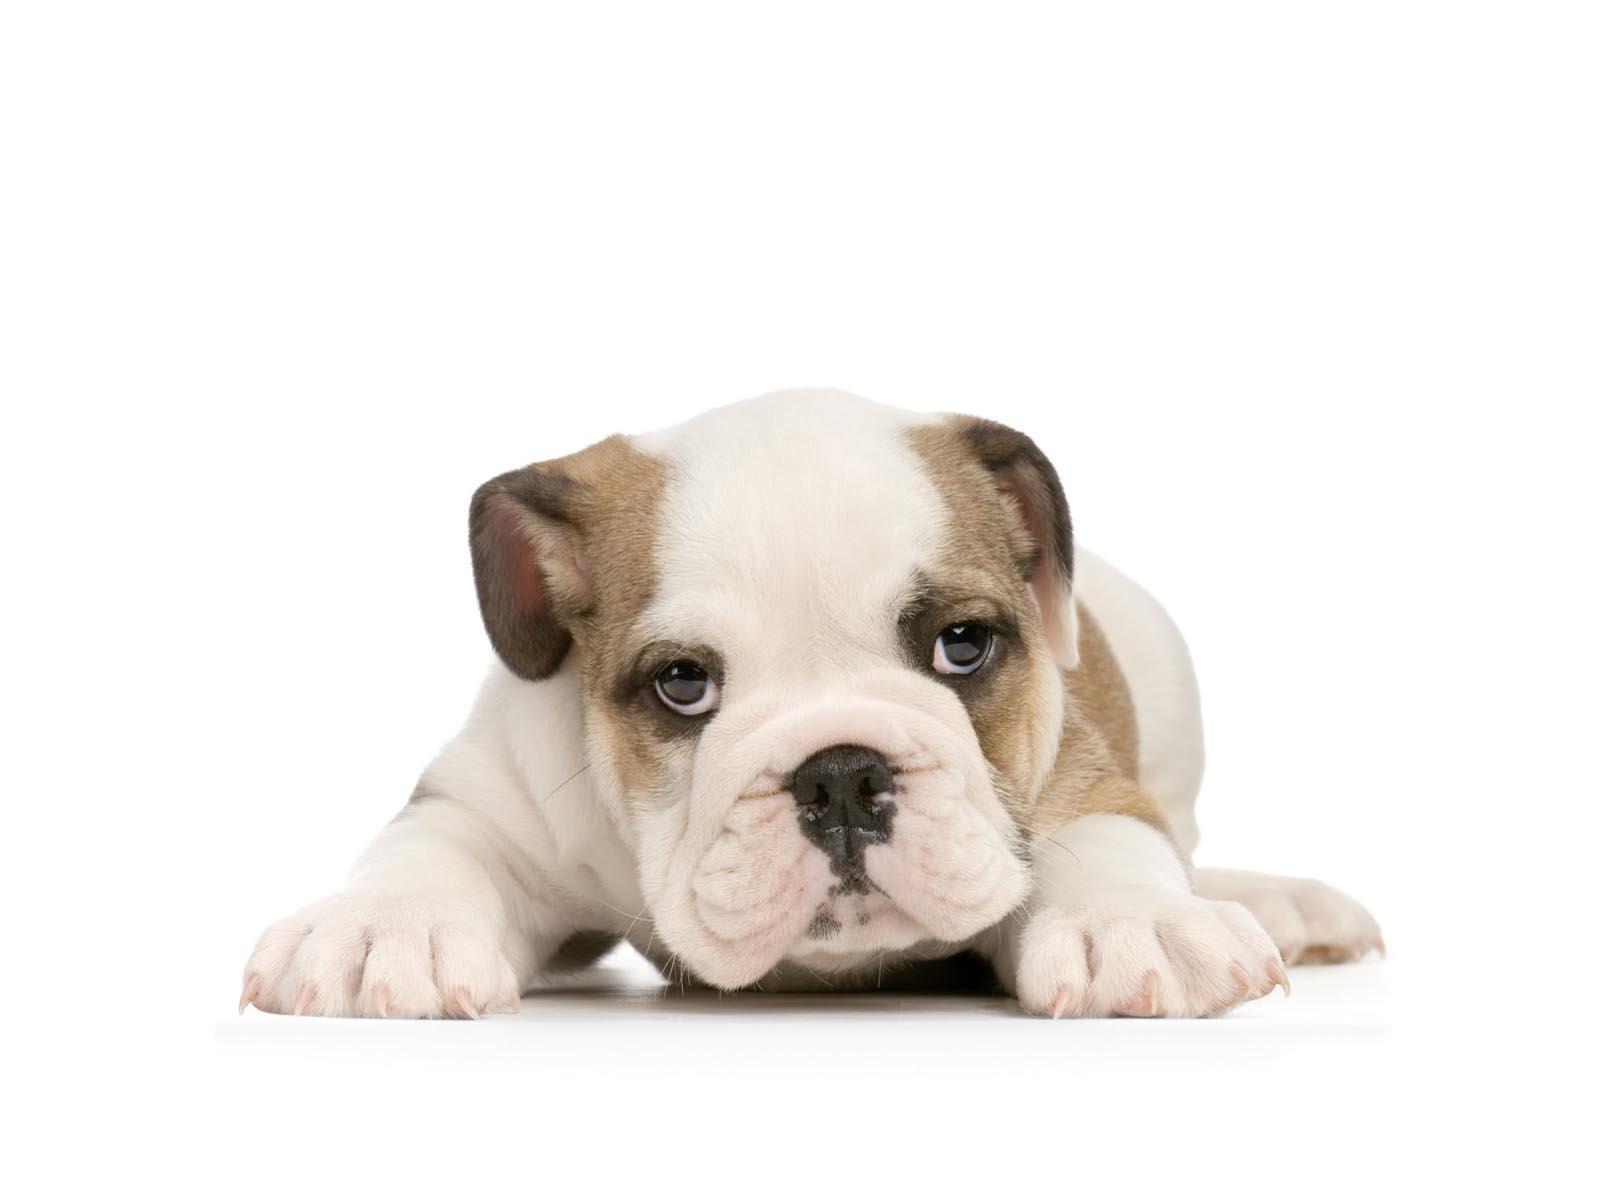 Cute Baby Pets Live Wallpaper Download Puppy Bulldog Hd Desktop Wallpapers 4k Hd